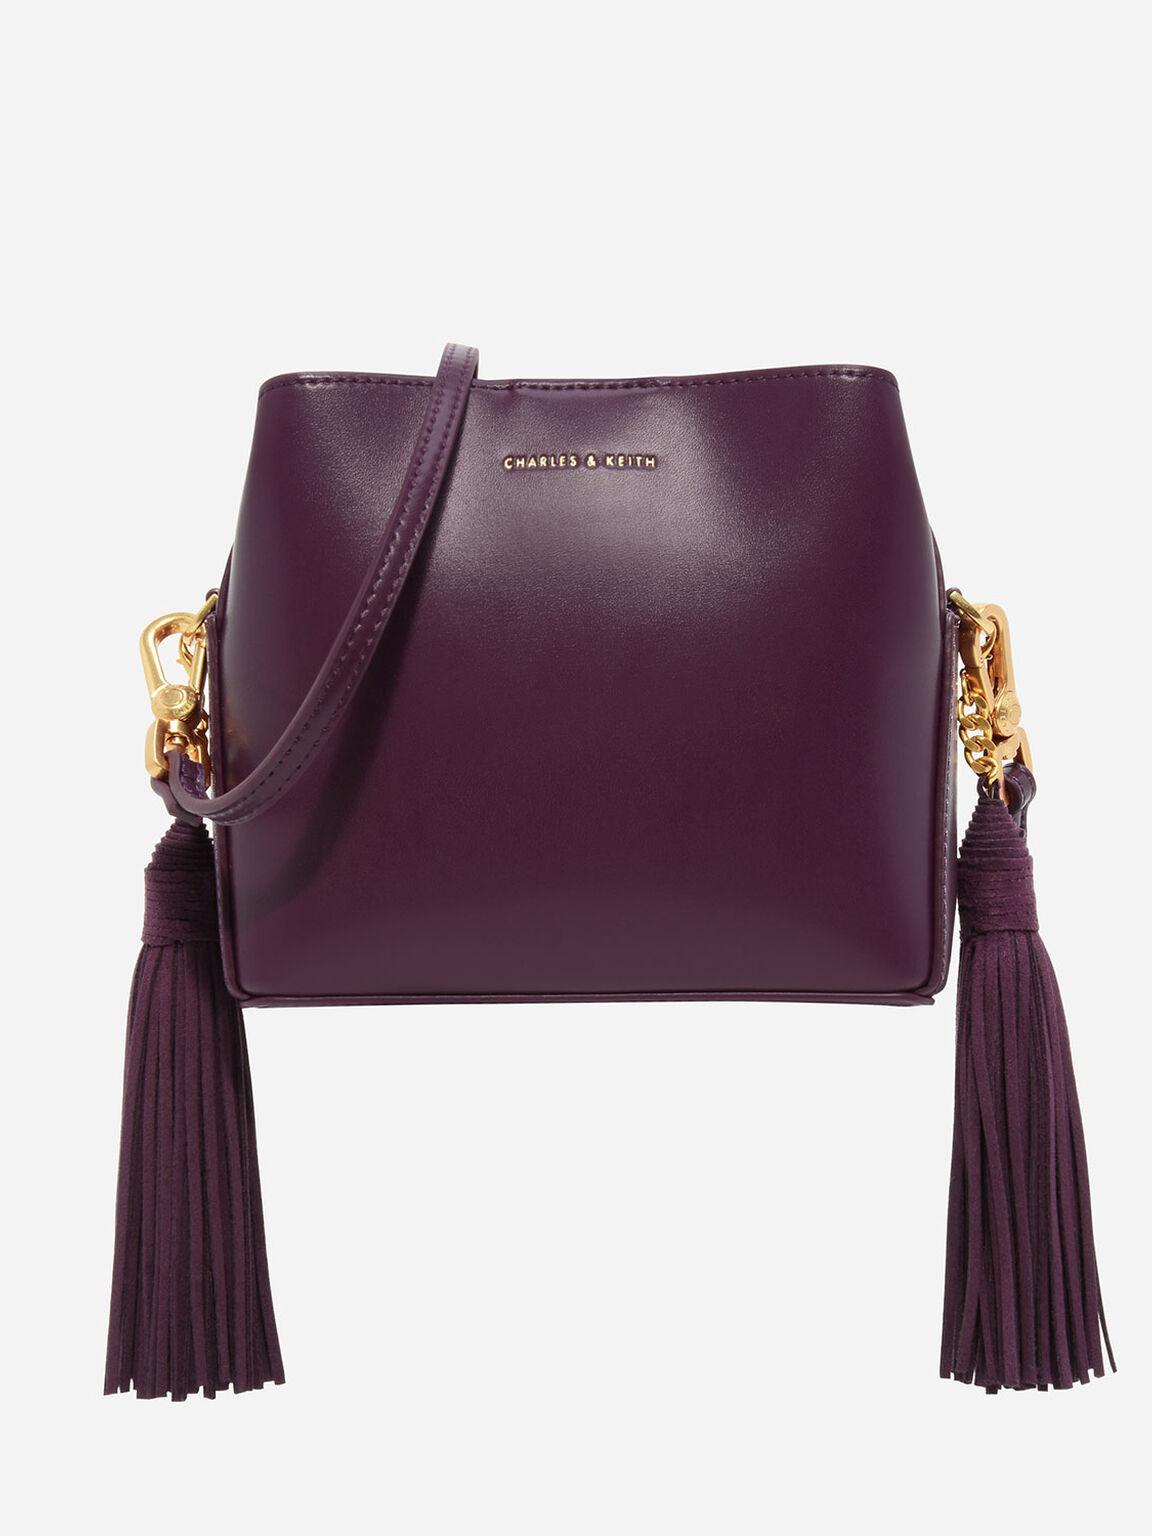 雙側流蘇肩背包, 深紫紅, hi-res